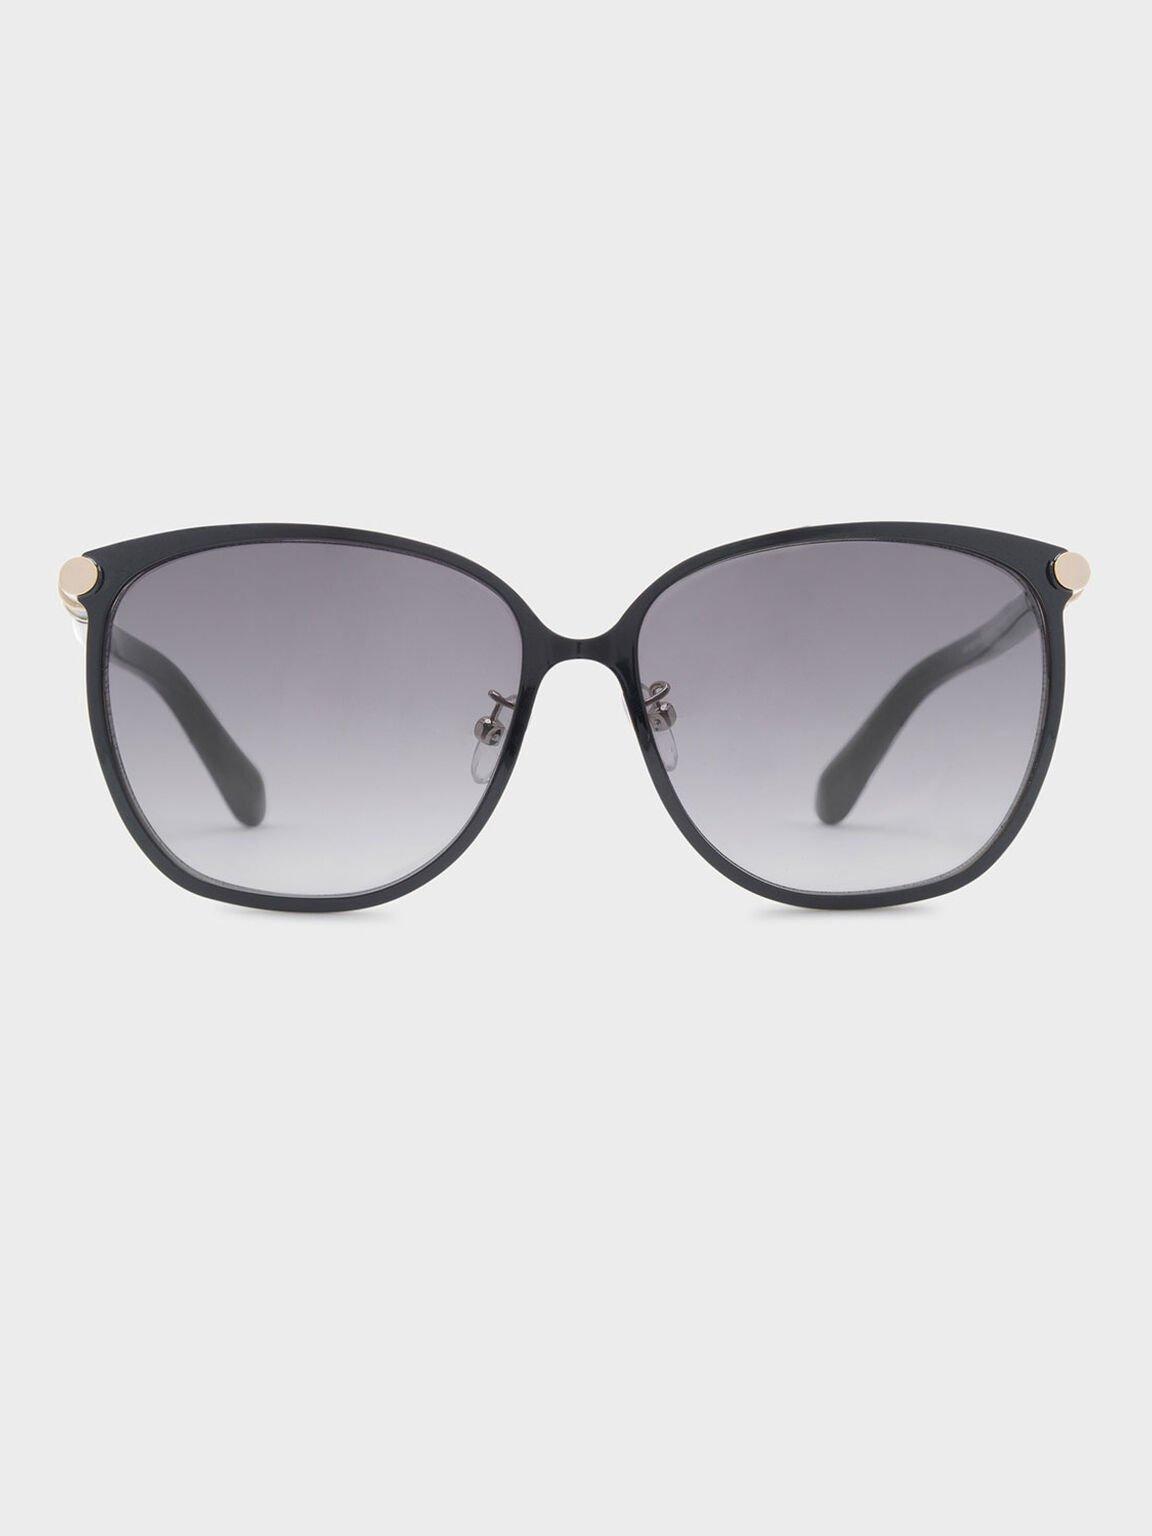 Oversized Sunglasses, Black, hi-res